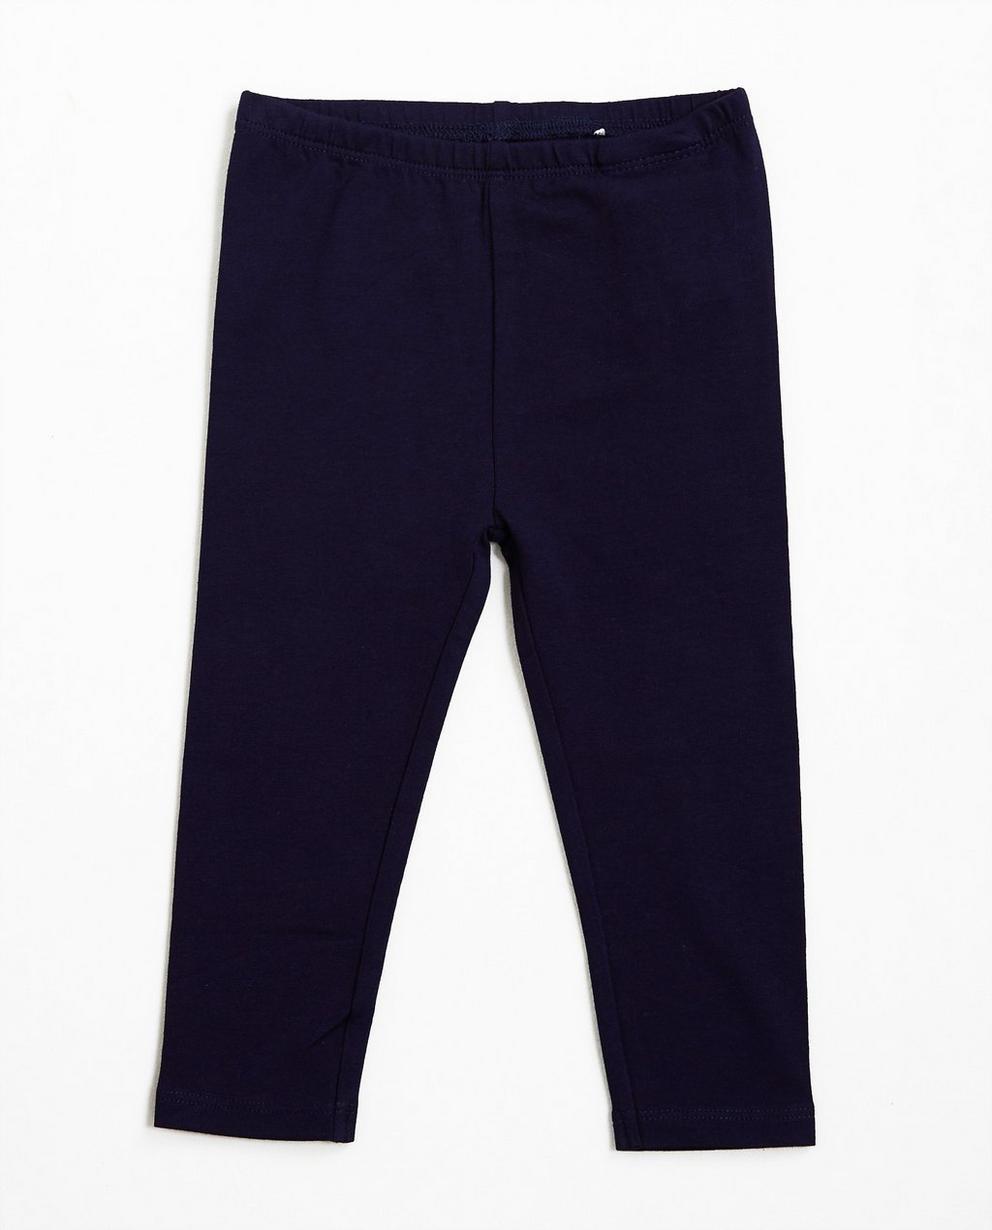 Leggings en coton bio - bleu nuit - JBC